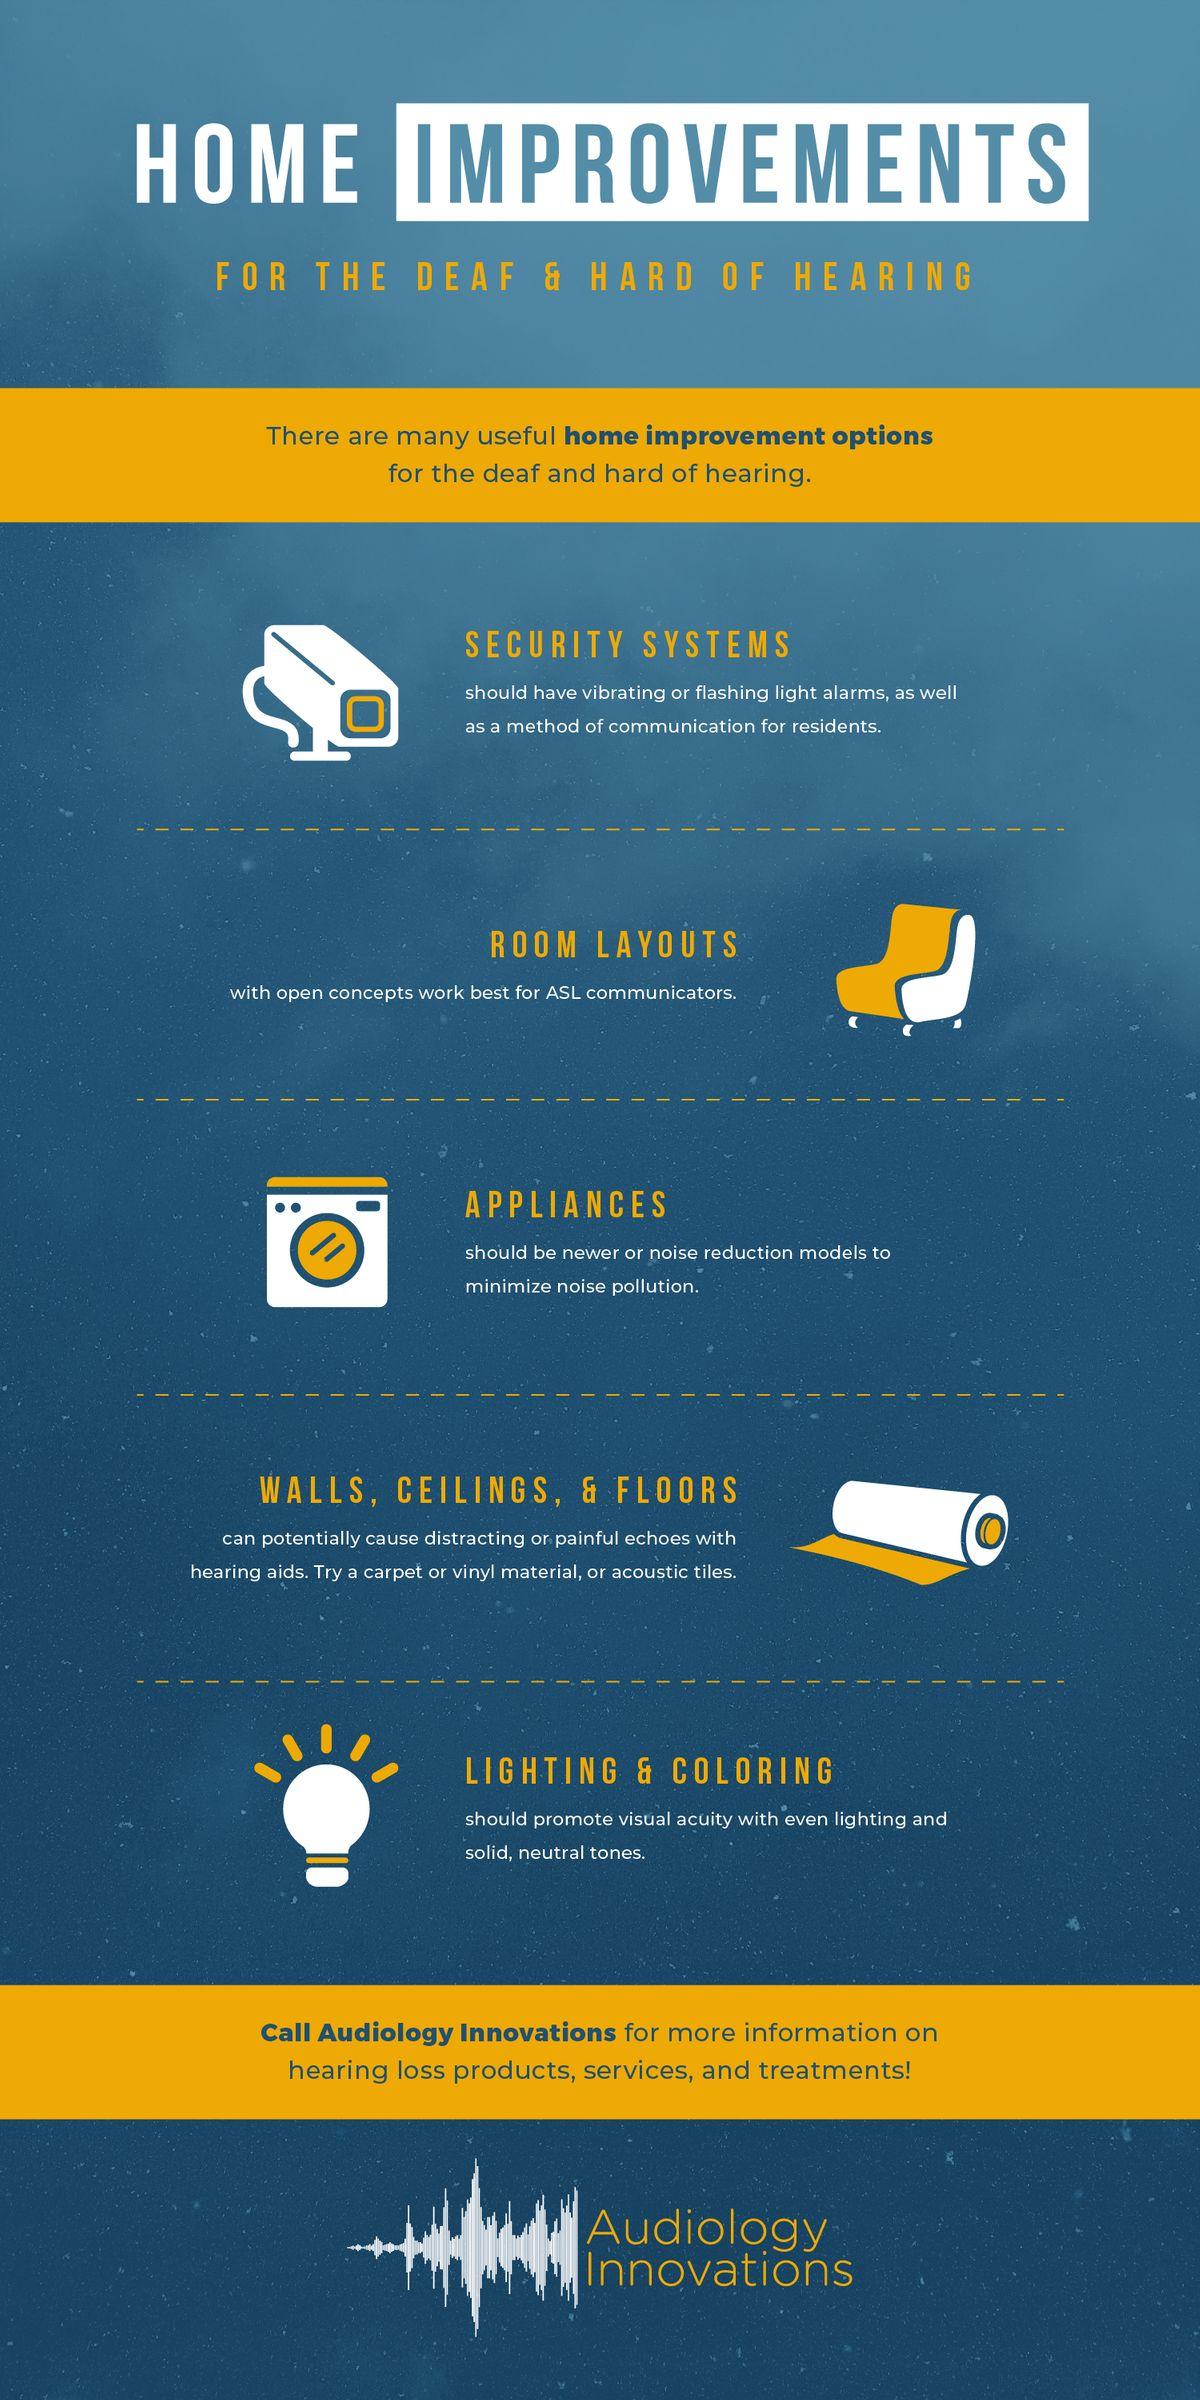 HomeImprovements-Infographic-01-5d4c32cf4bfea.jpg